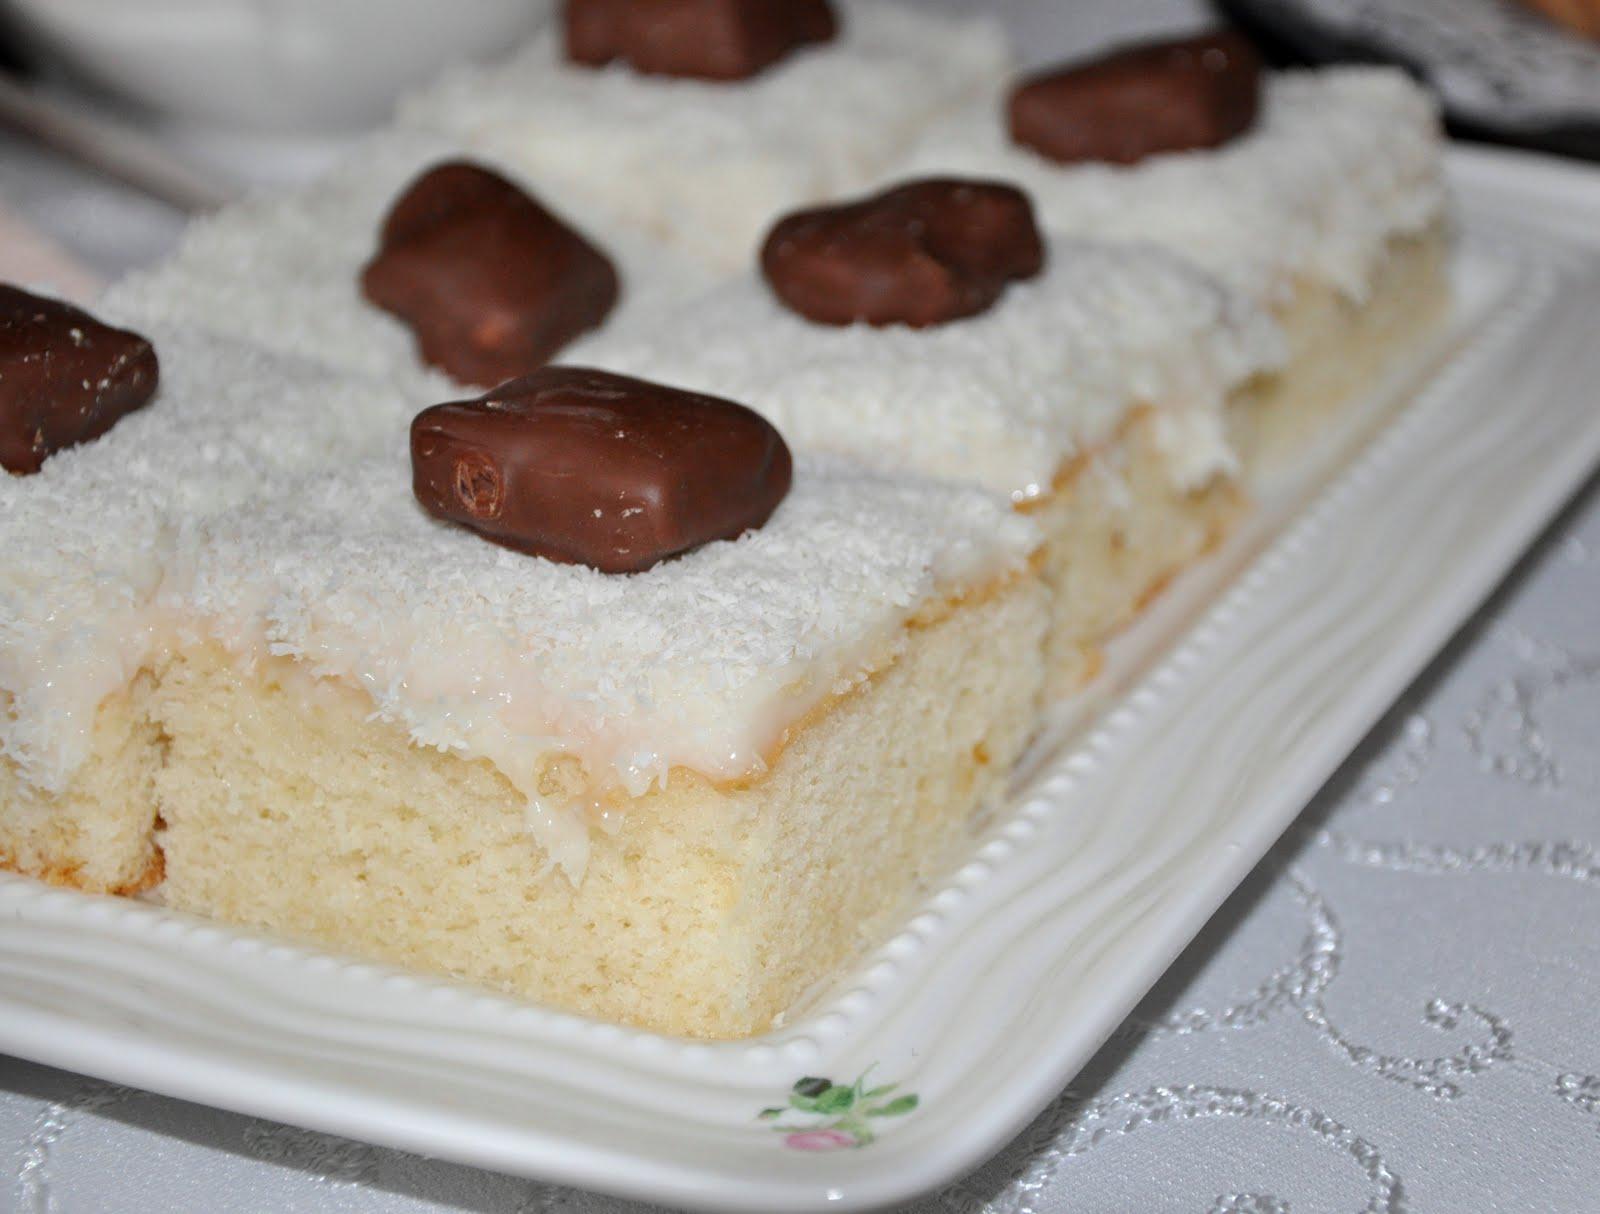 Pirin� unlu bayatlamayan kek tarifi